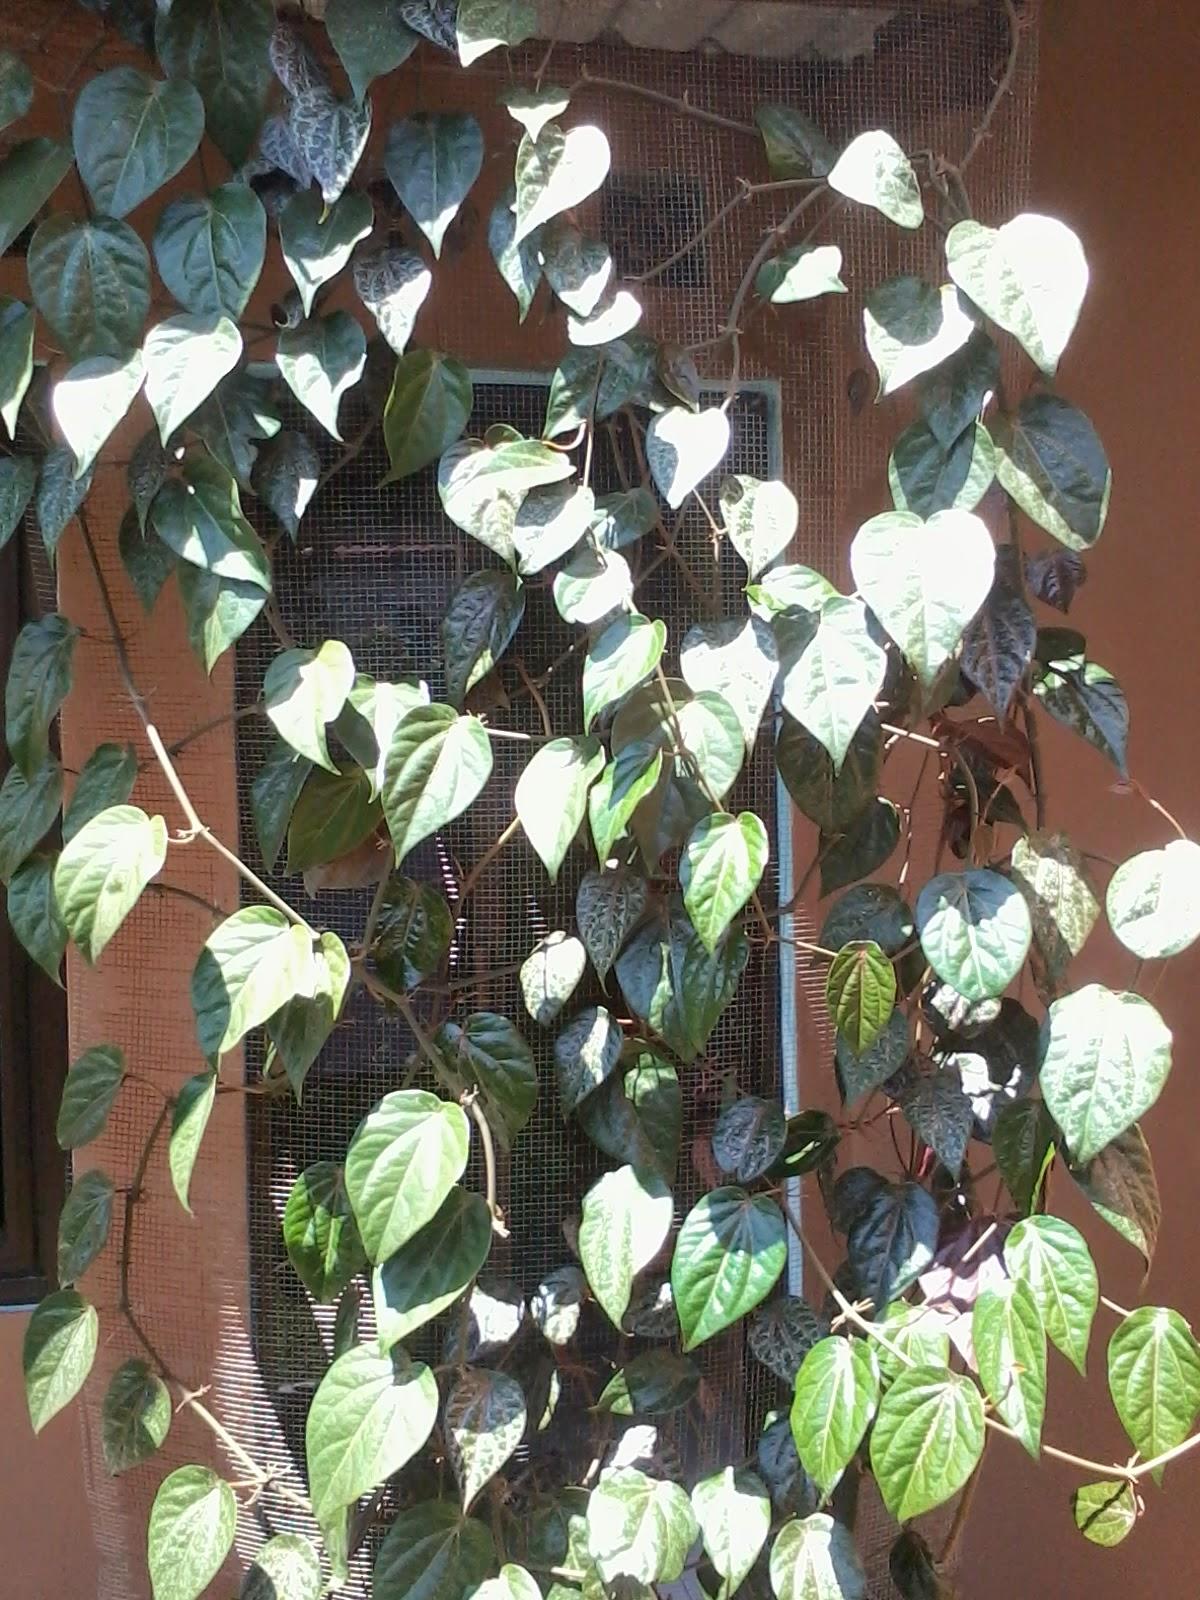 2014-04-20+12.49.49 Khasiat Daun Sirih Merah manfaat daun sirih hepatitis ginjal daun sirih merah daun sirih asam urat ambeien